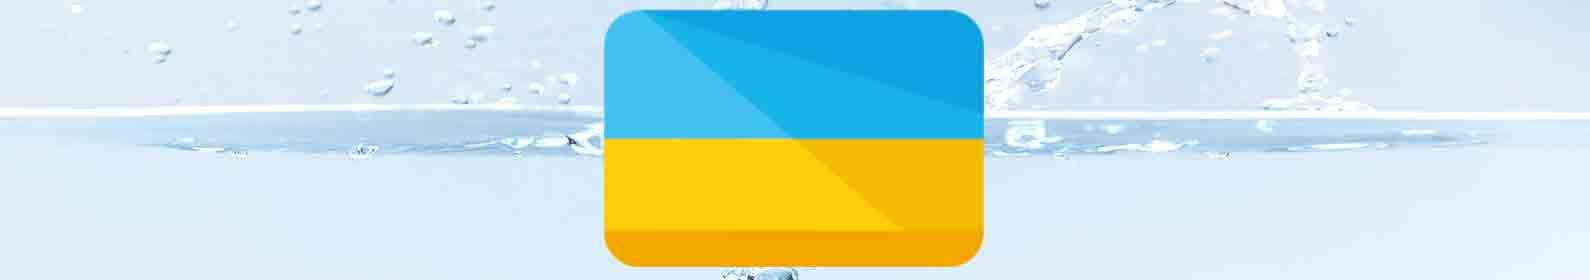 water-treatment-ukraine.jpg